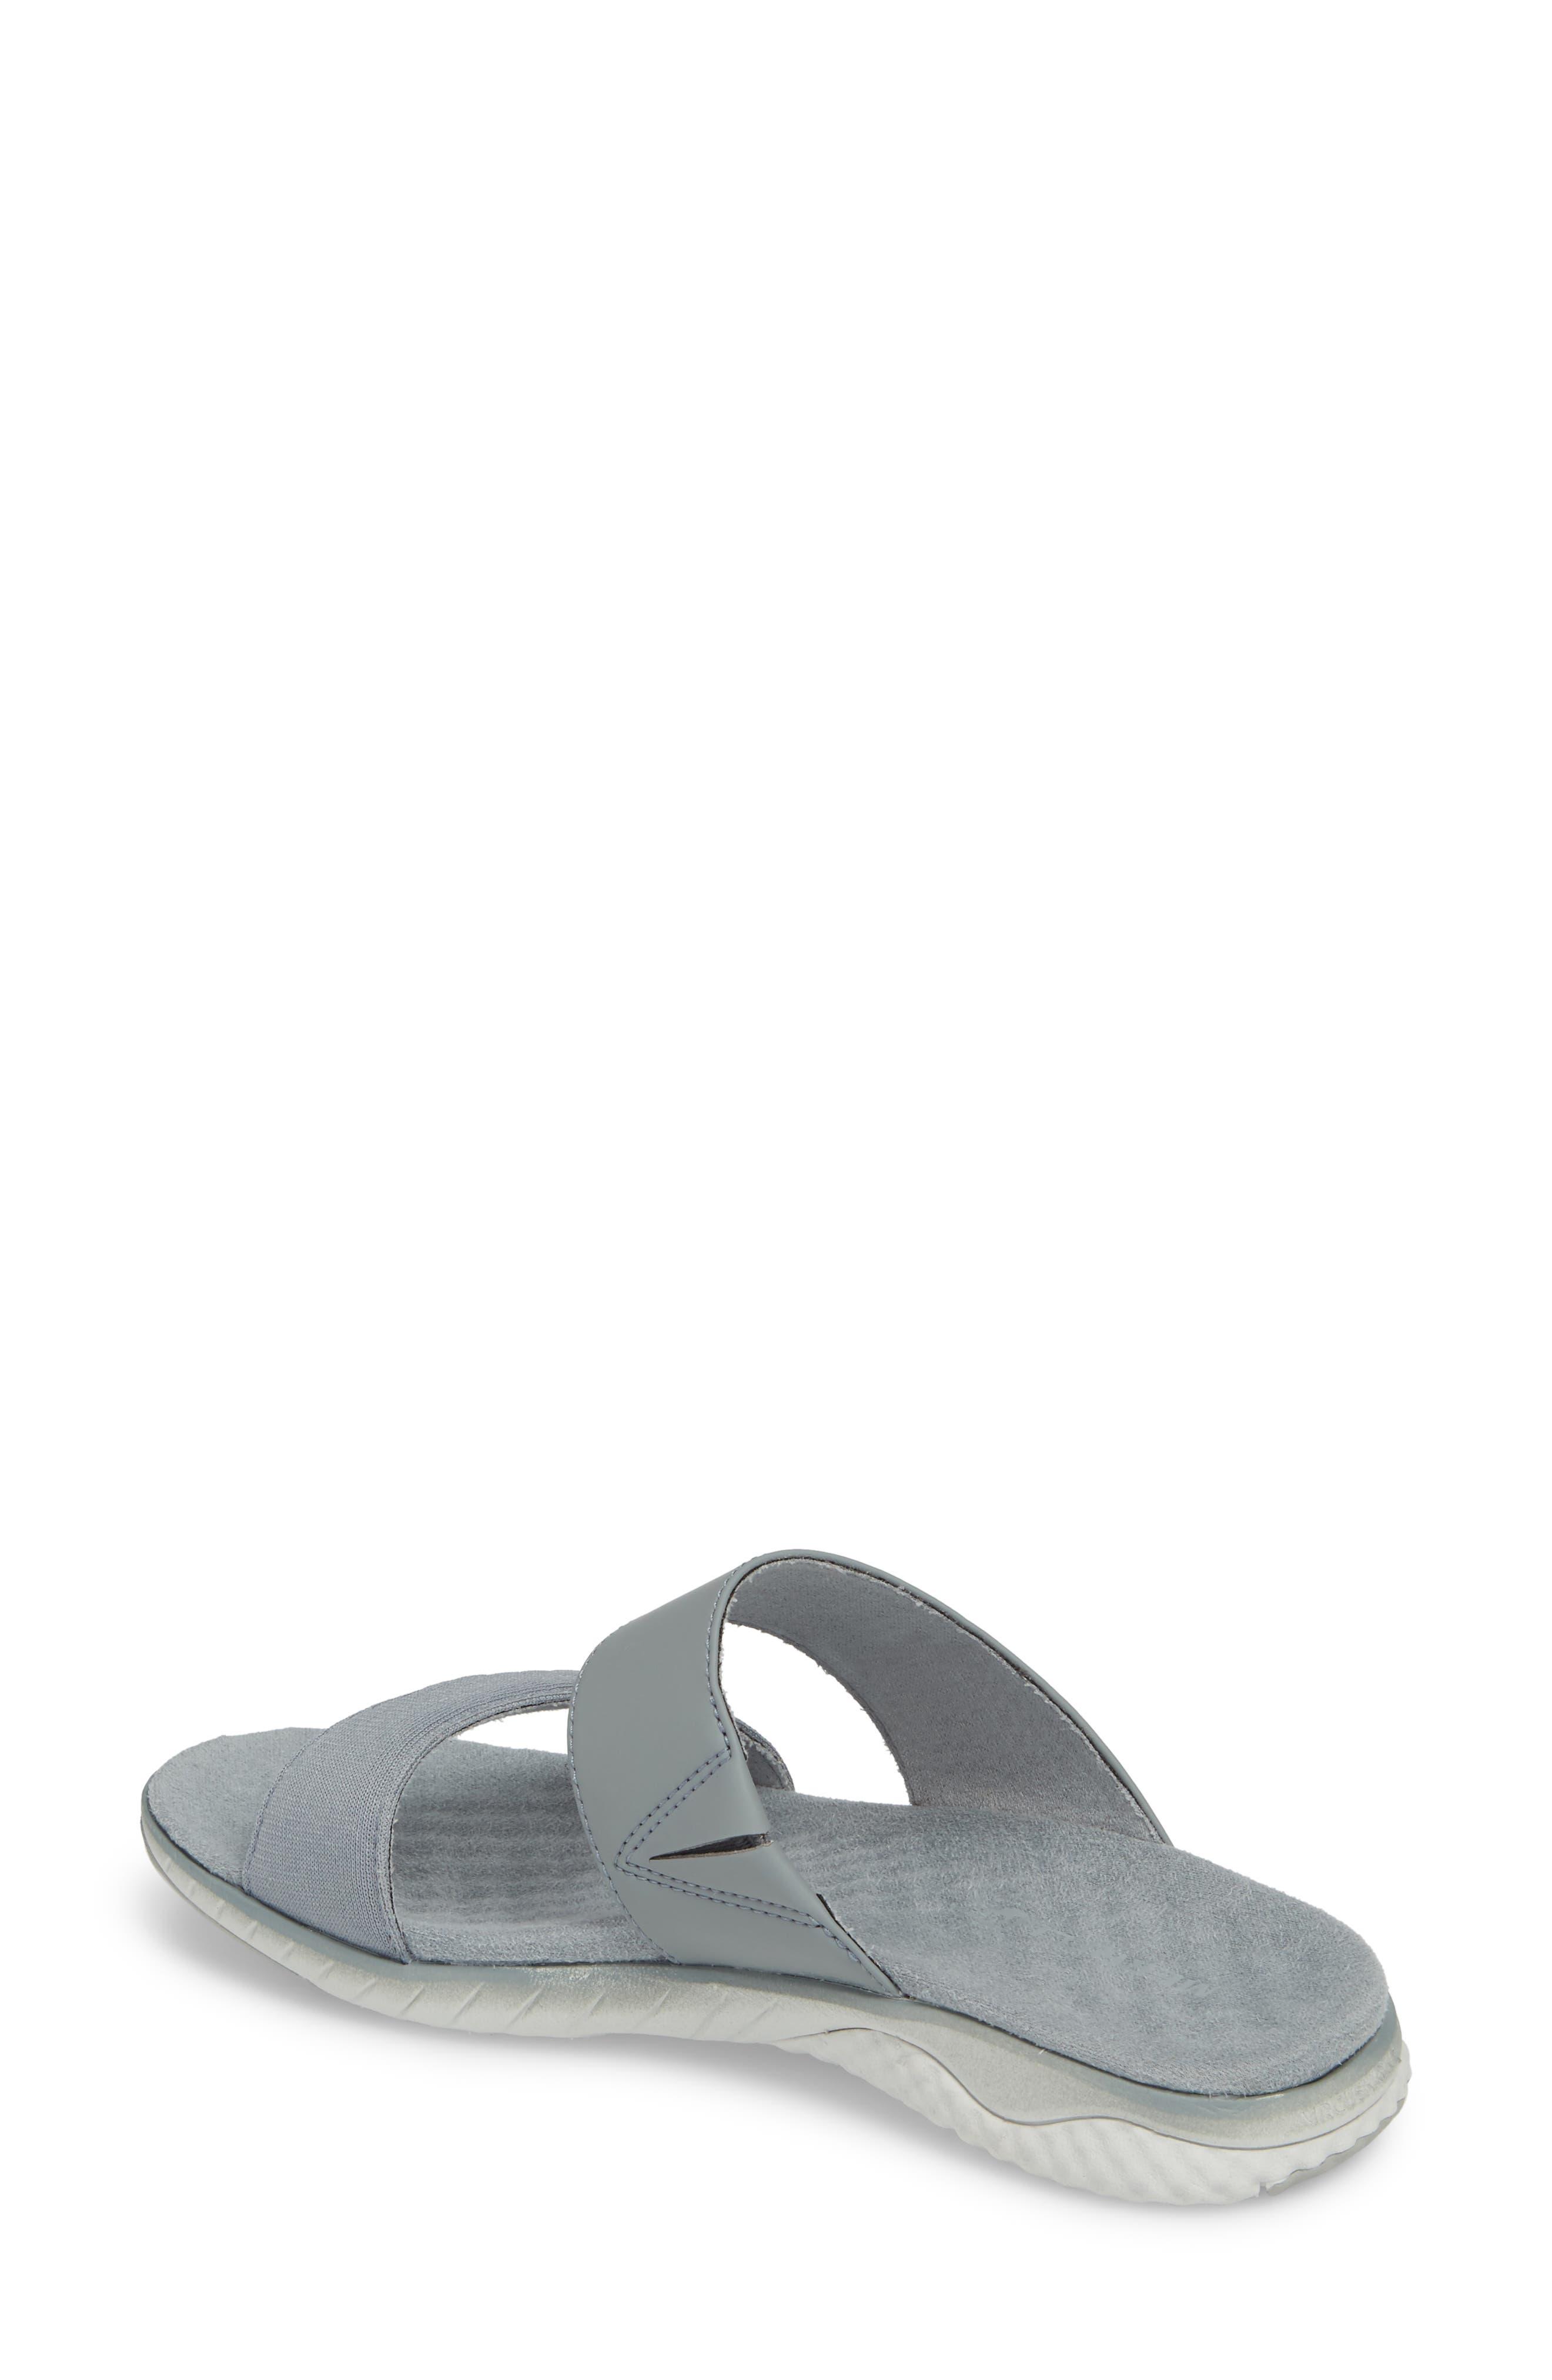 1SIX8 Linna Air Cushion+ Slide Sandal,                             Alternate thumbnail 6, color,